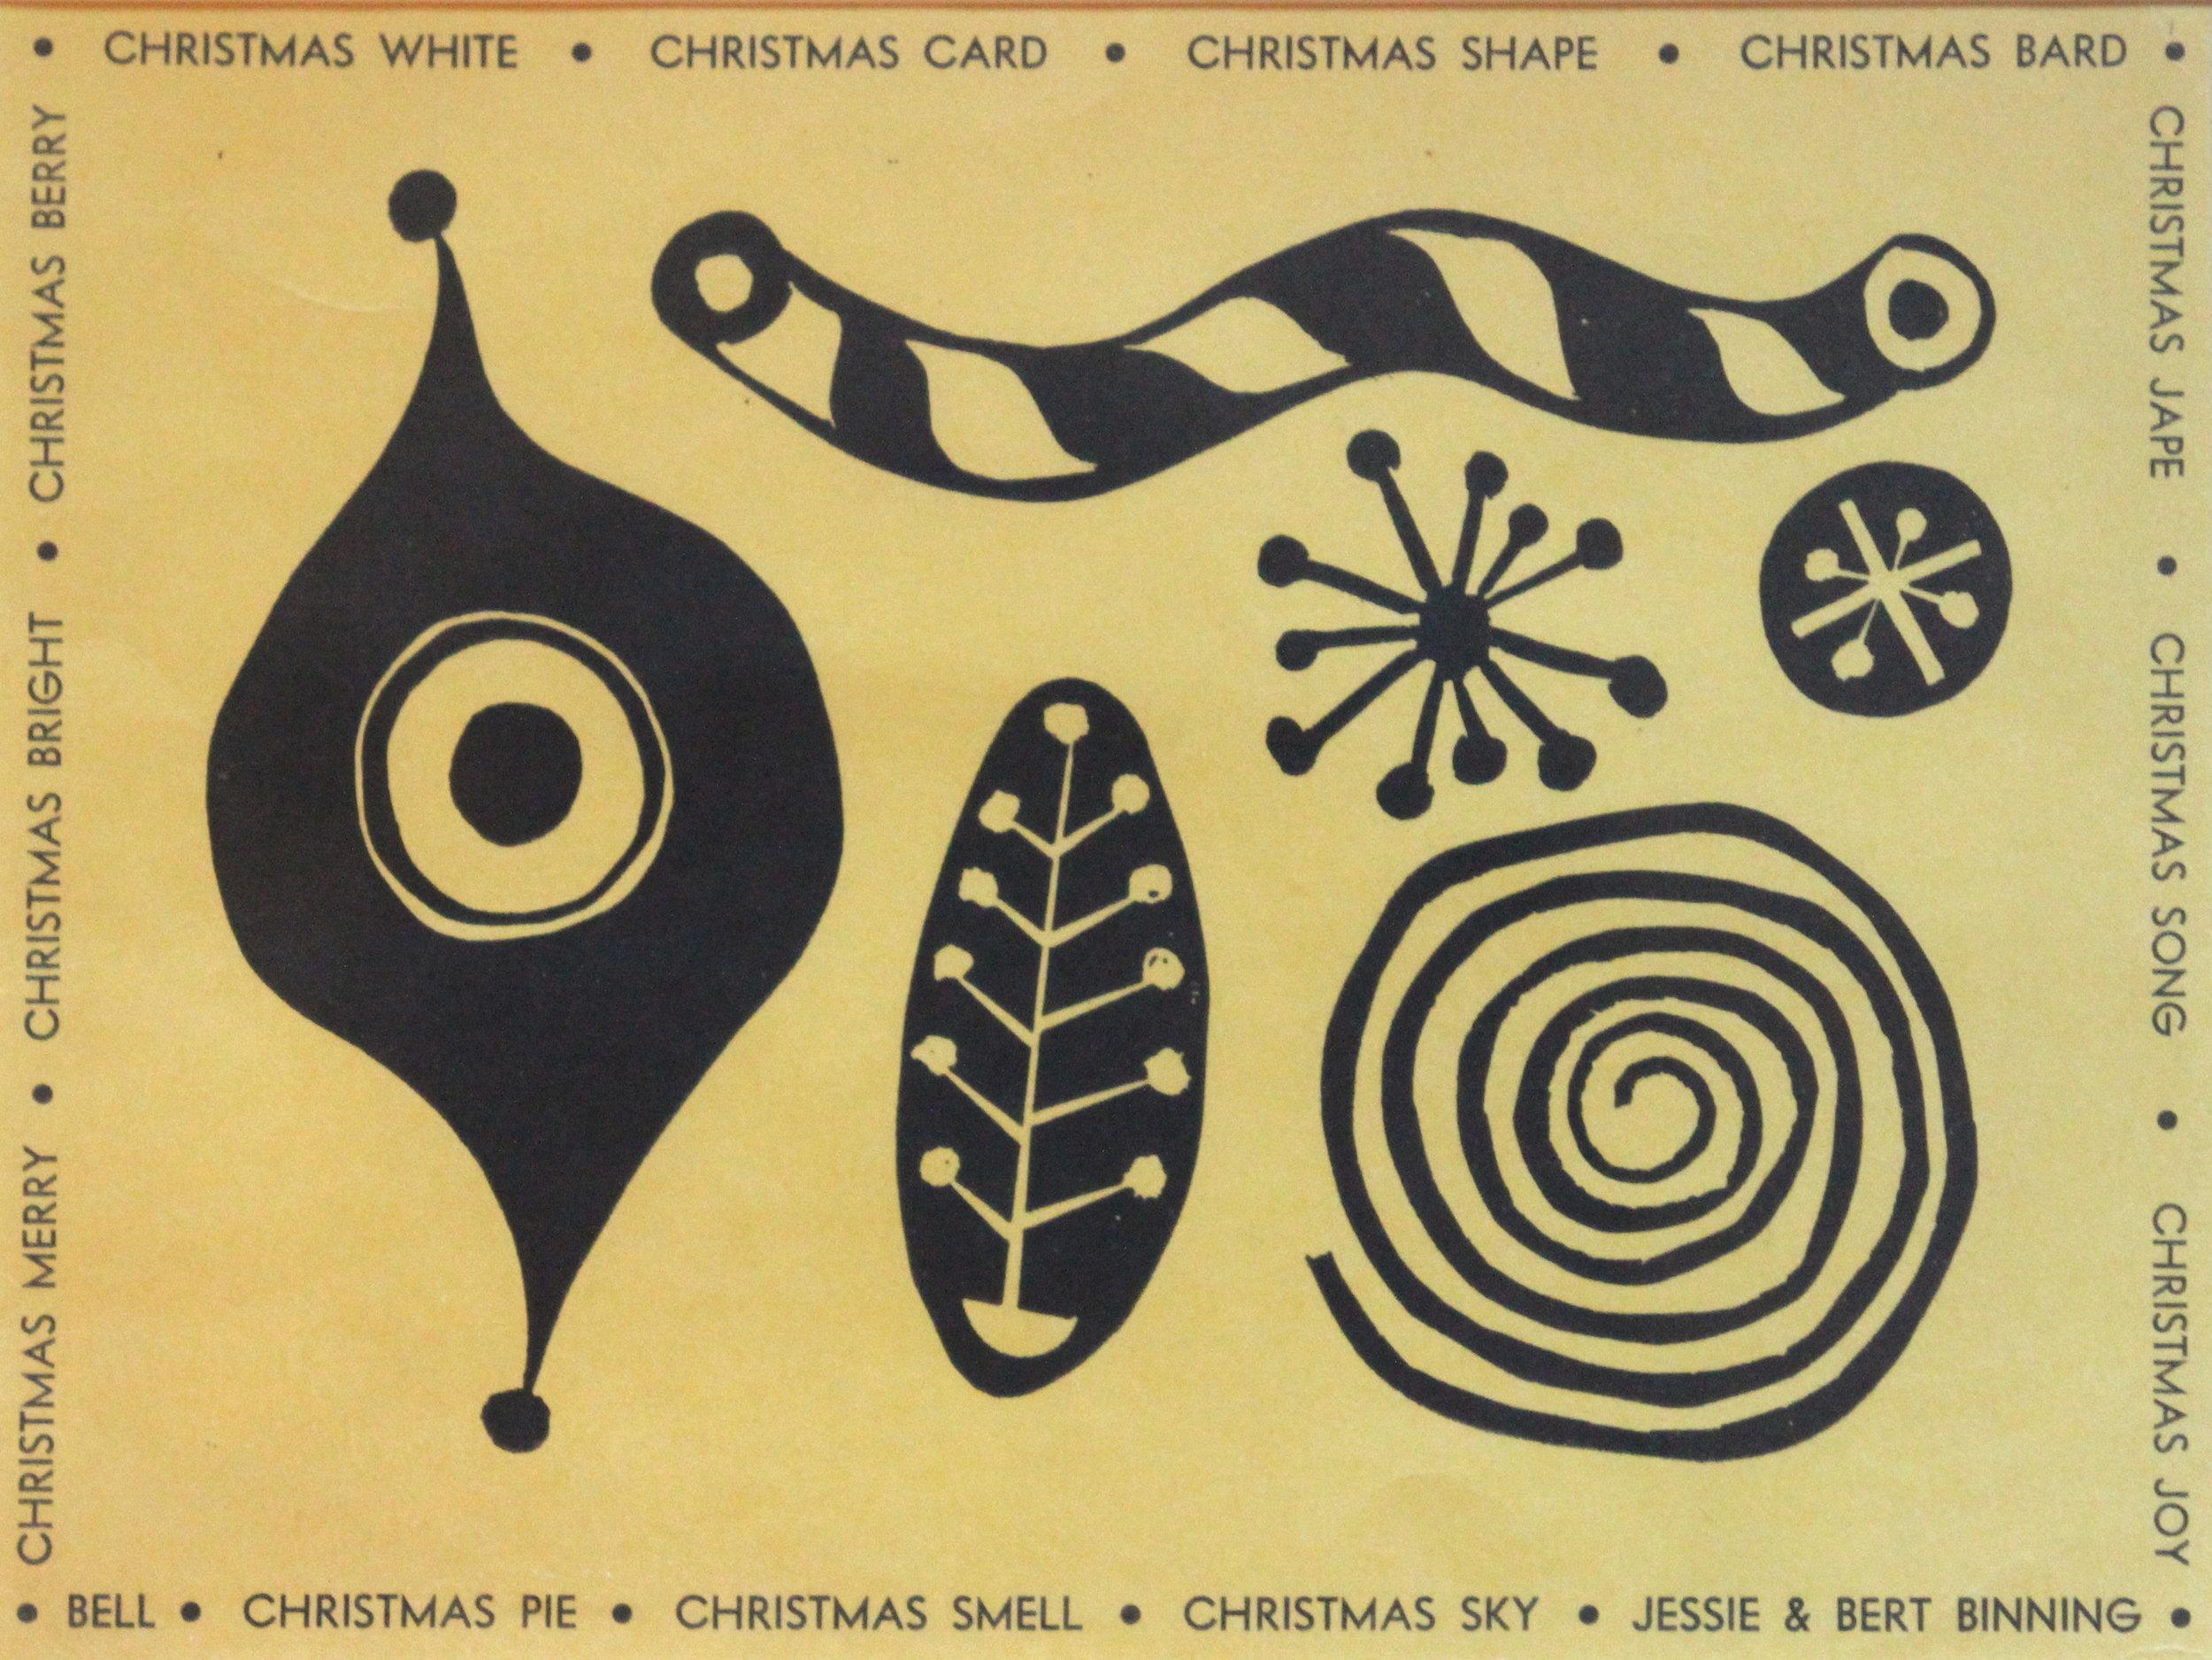 B.C. Binning, Christmas Card